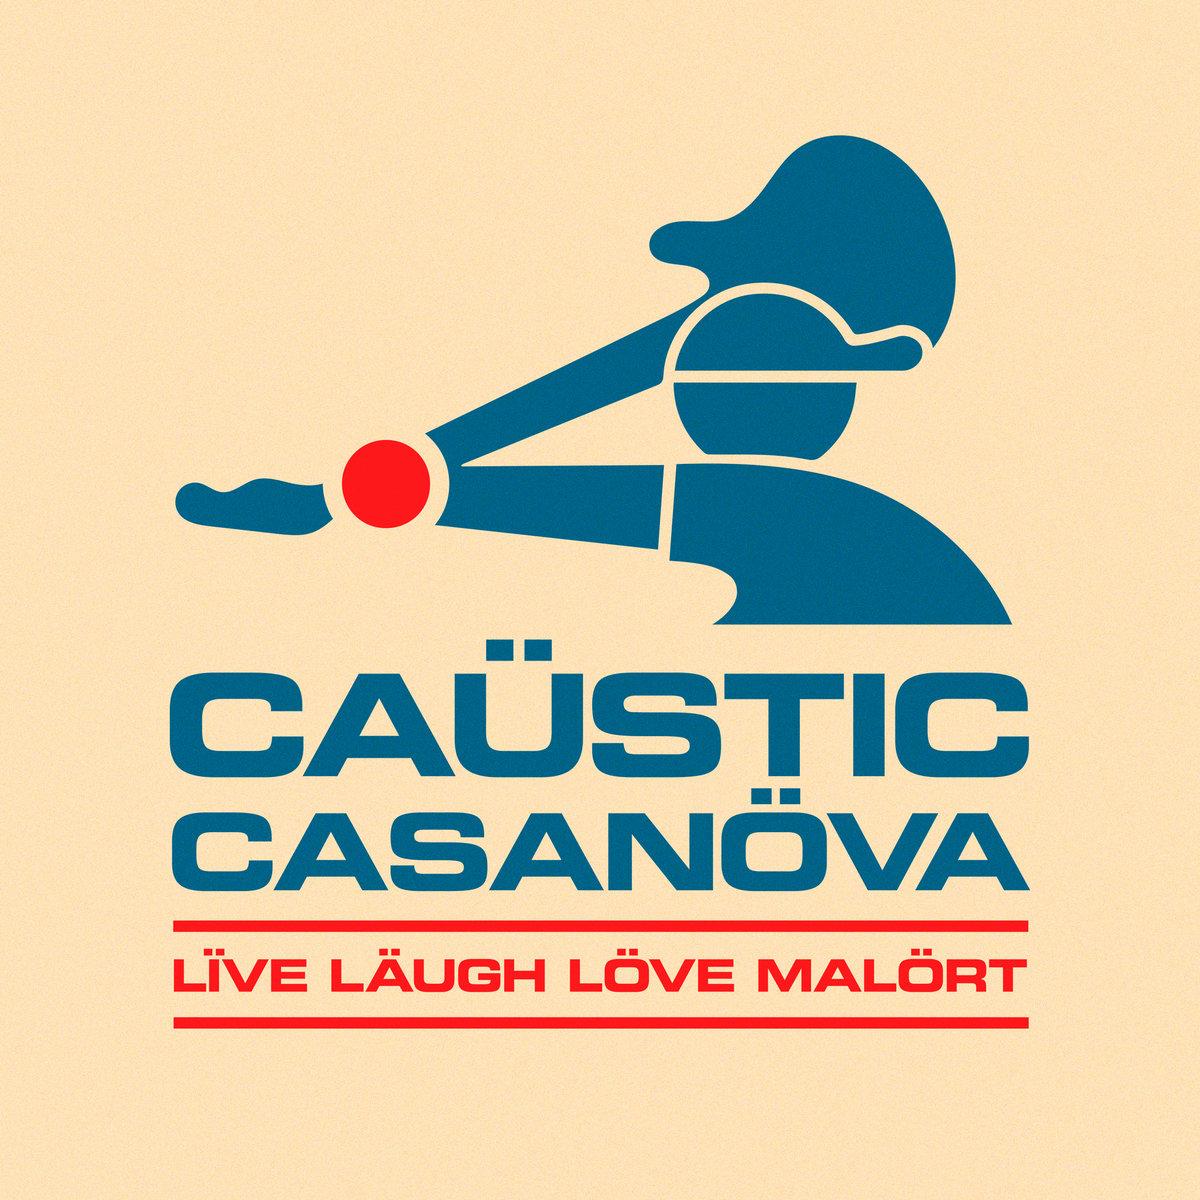 CAUSTIC CASANOVA LIVE LAUGH LOVE MALORT